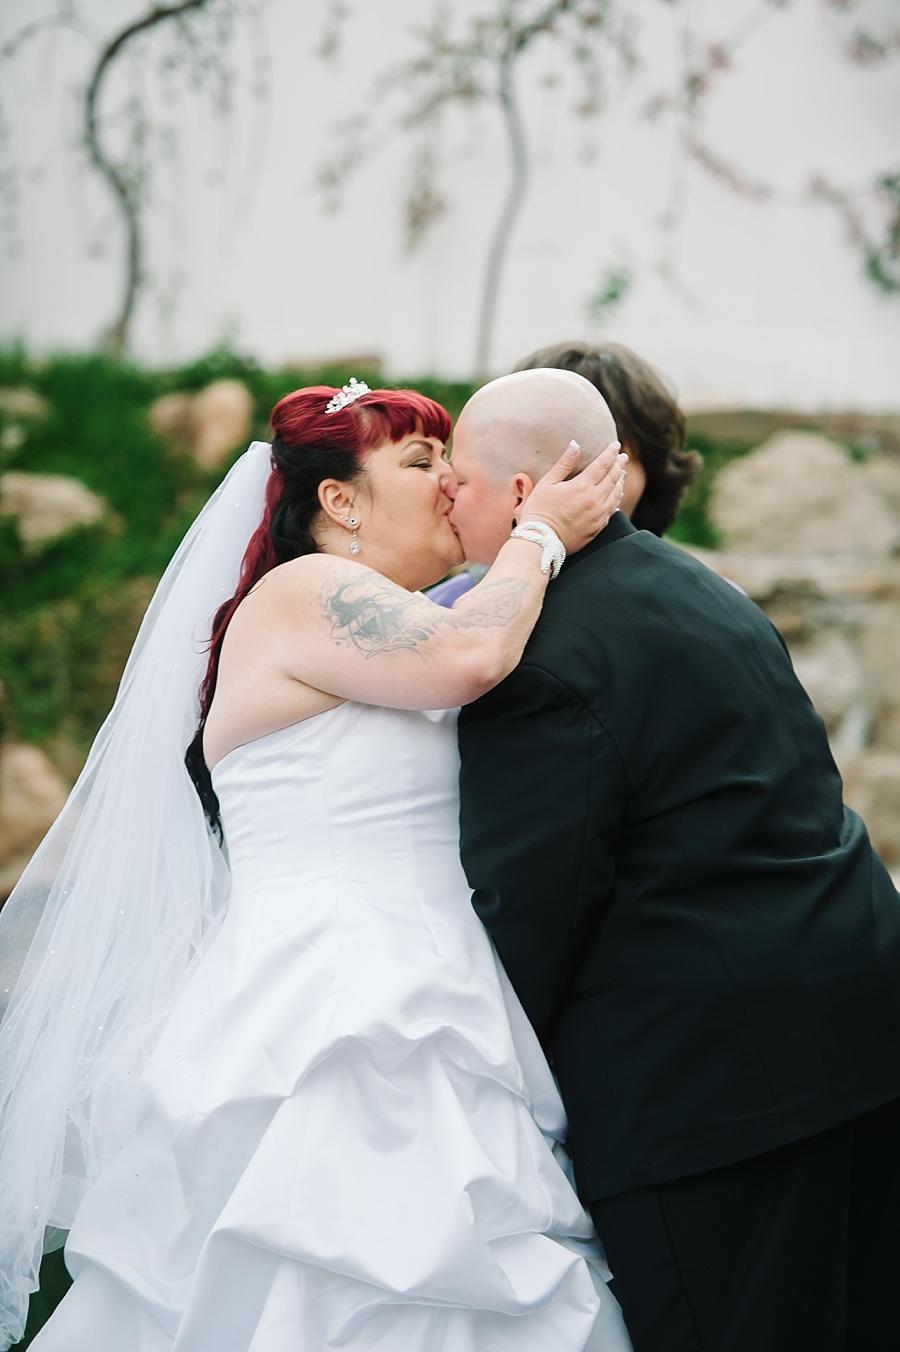 Utah Same Sex Wedding Photographer 025